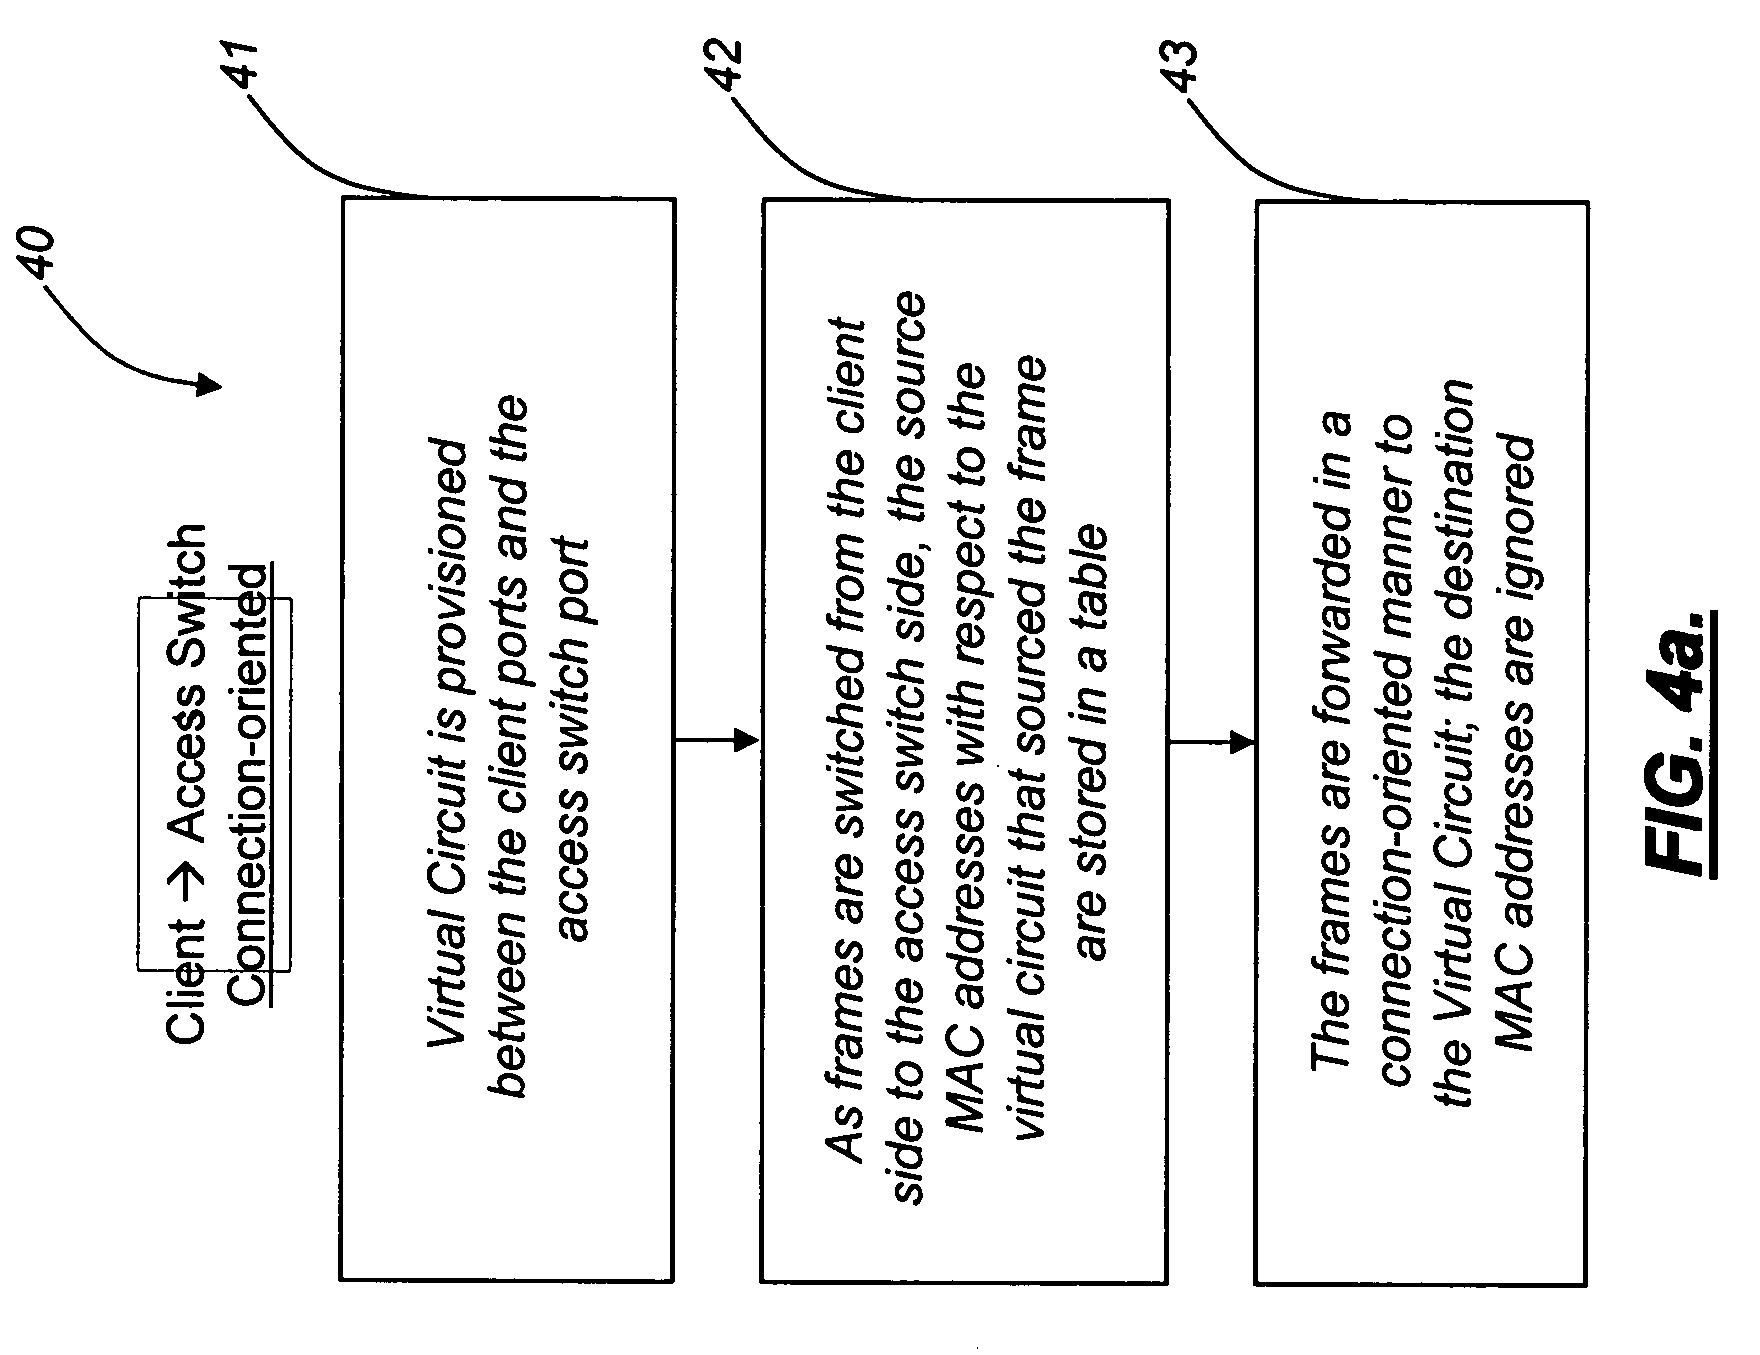 Patent Us 20070299987a1 Virtualcircuit 0 Petitions